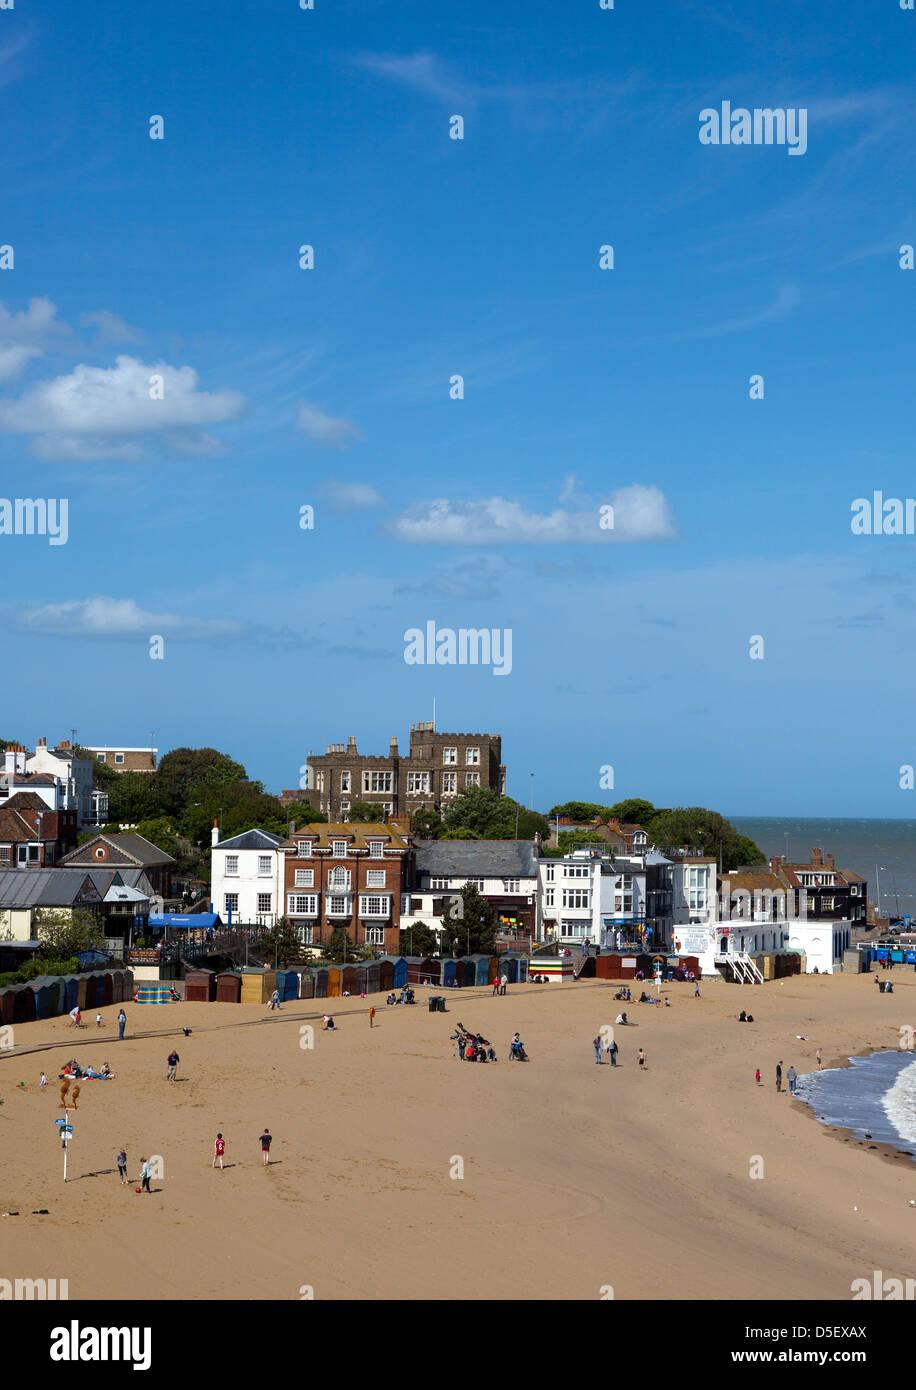 Broadstairs Beach - Stock Image